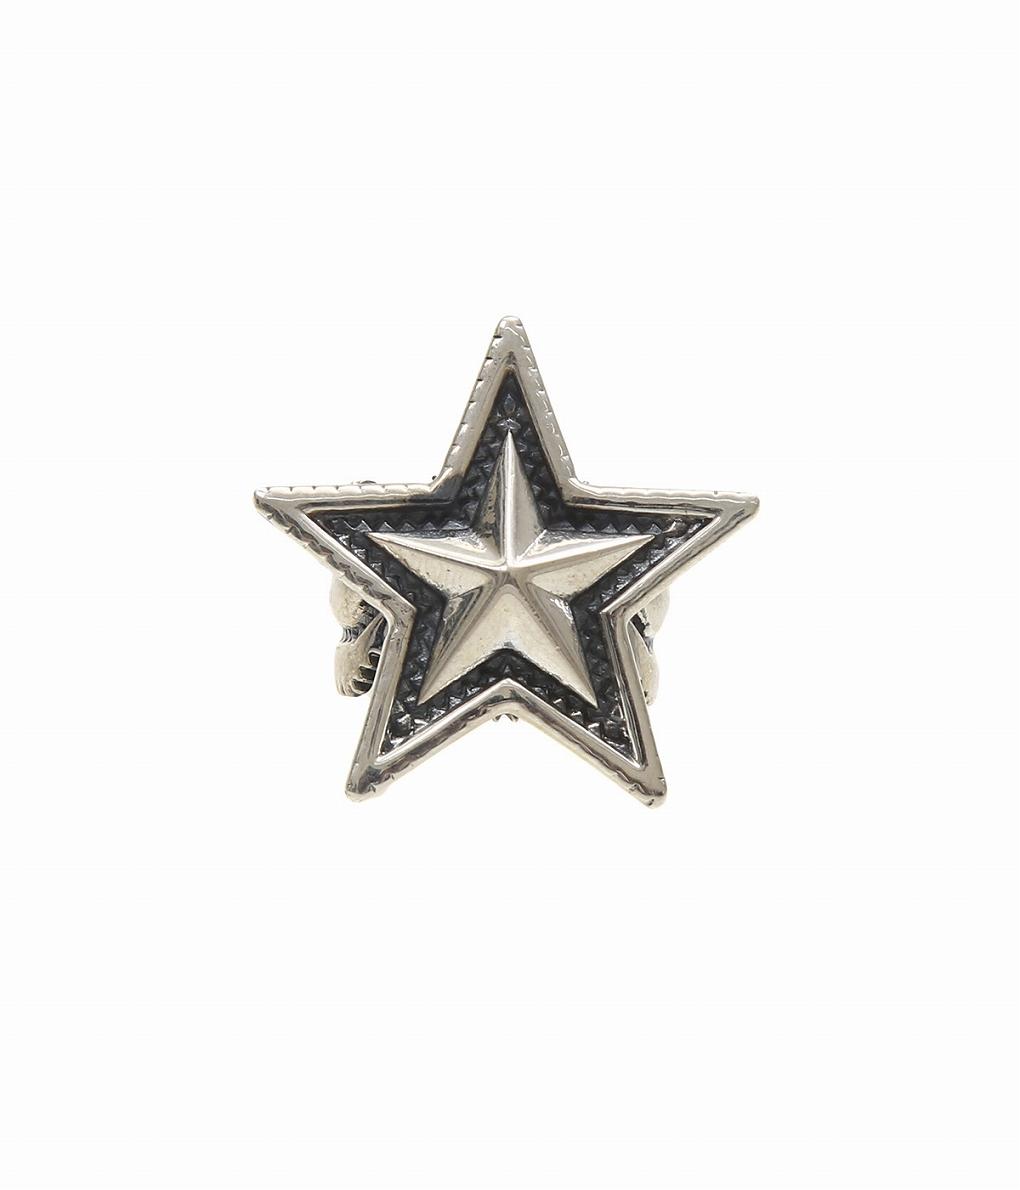 CODY SANDERSON / コディ サンダーソン : Medium Star Ring-リング- : ミディアムスター リング 指輪 アクセサリー : C2-01-007 【RIP】